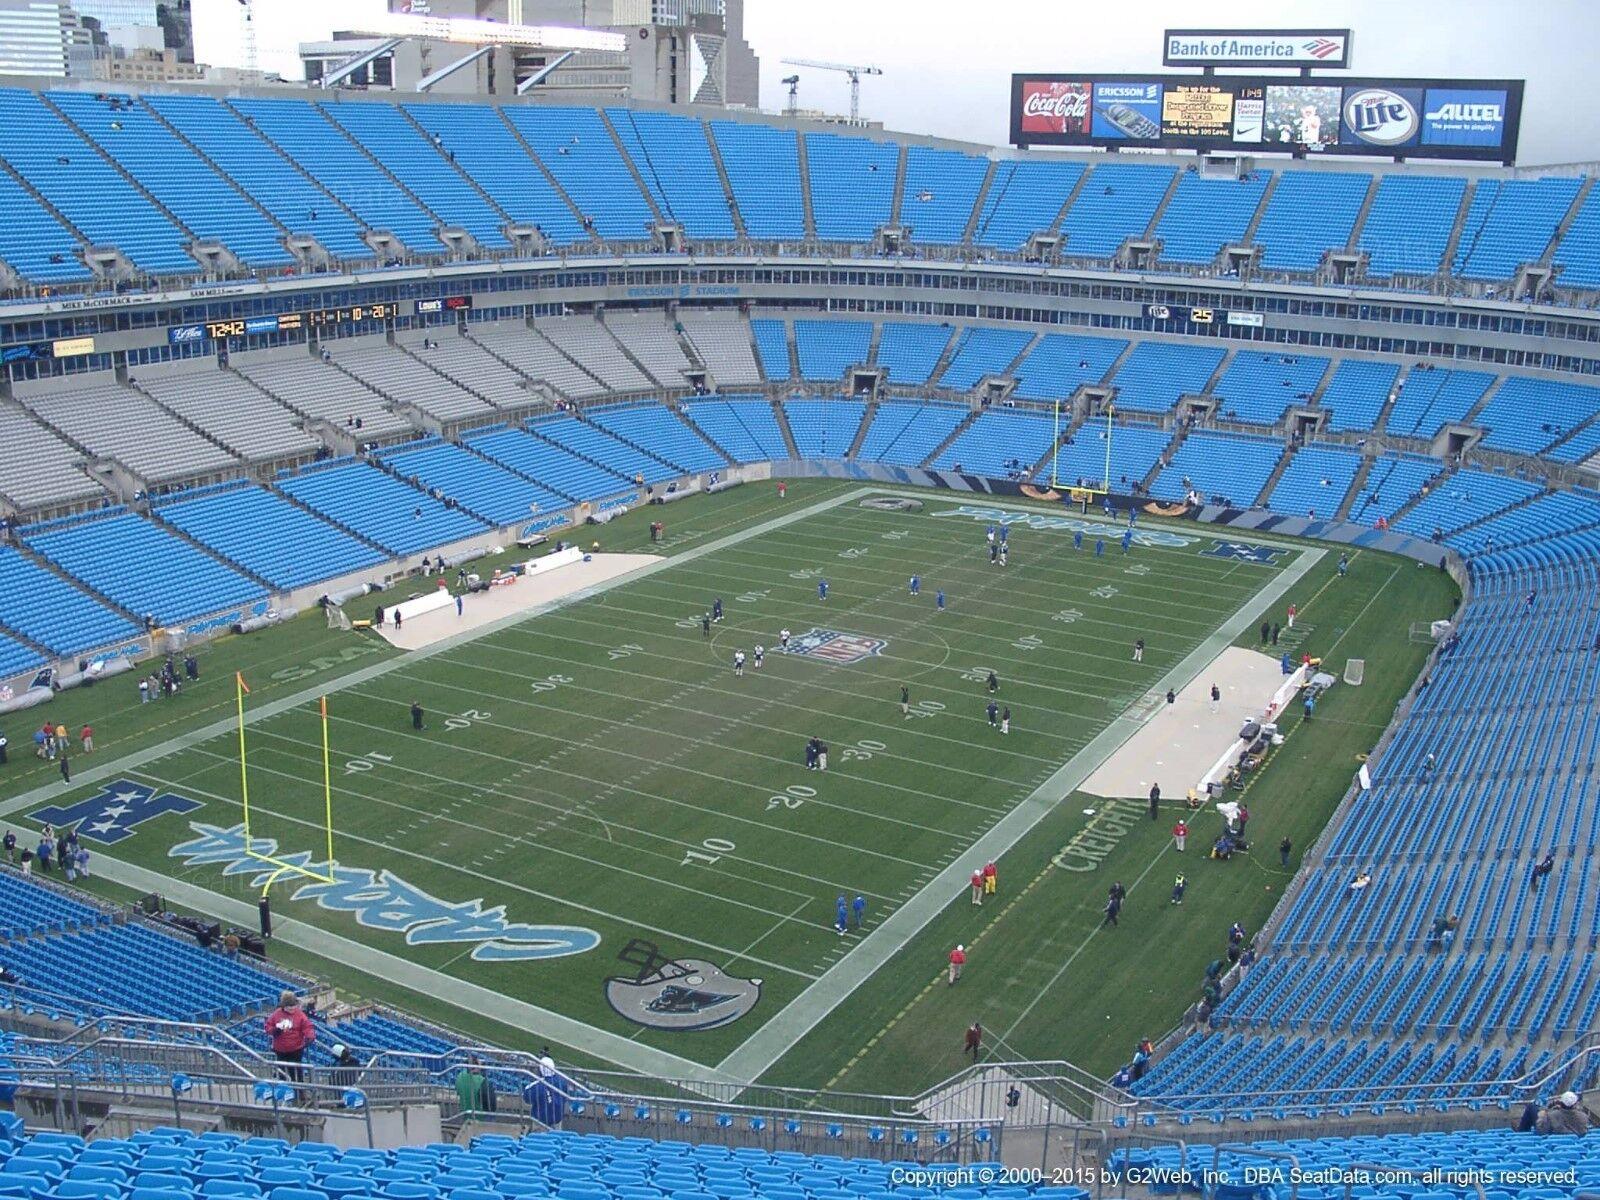 Carolina Panthers PSL Sec 551, Row 3, Season Tickets EVERY year!!